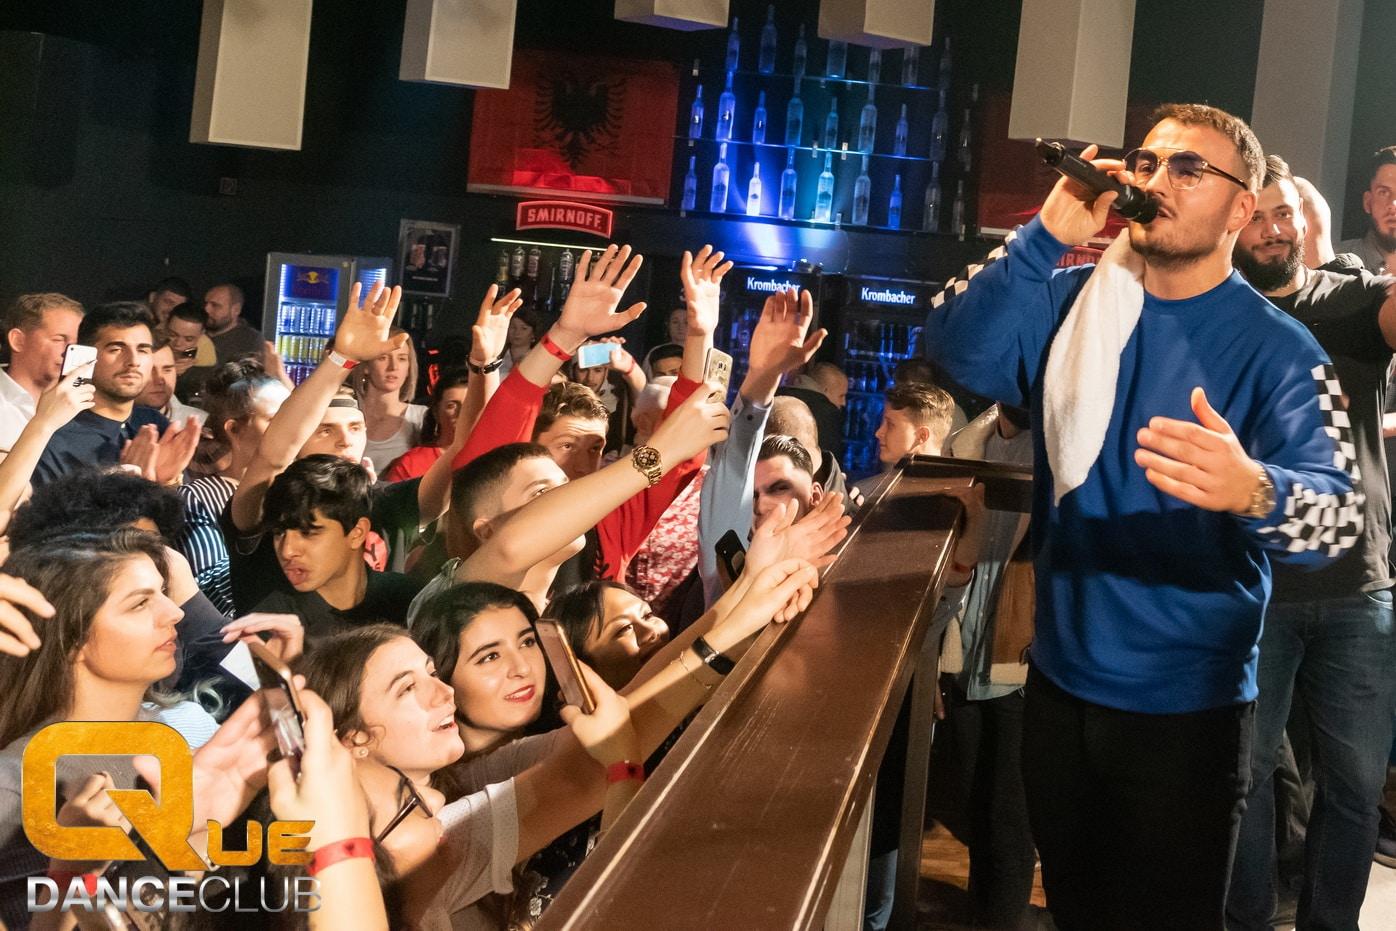 2018_12_08_Que_Danceclub_Paparazzo_Night_Ardian_Bujupi_Live_Nightlife_Scene_Timo_066